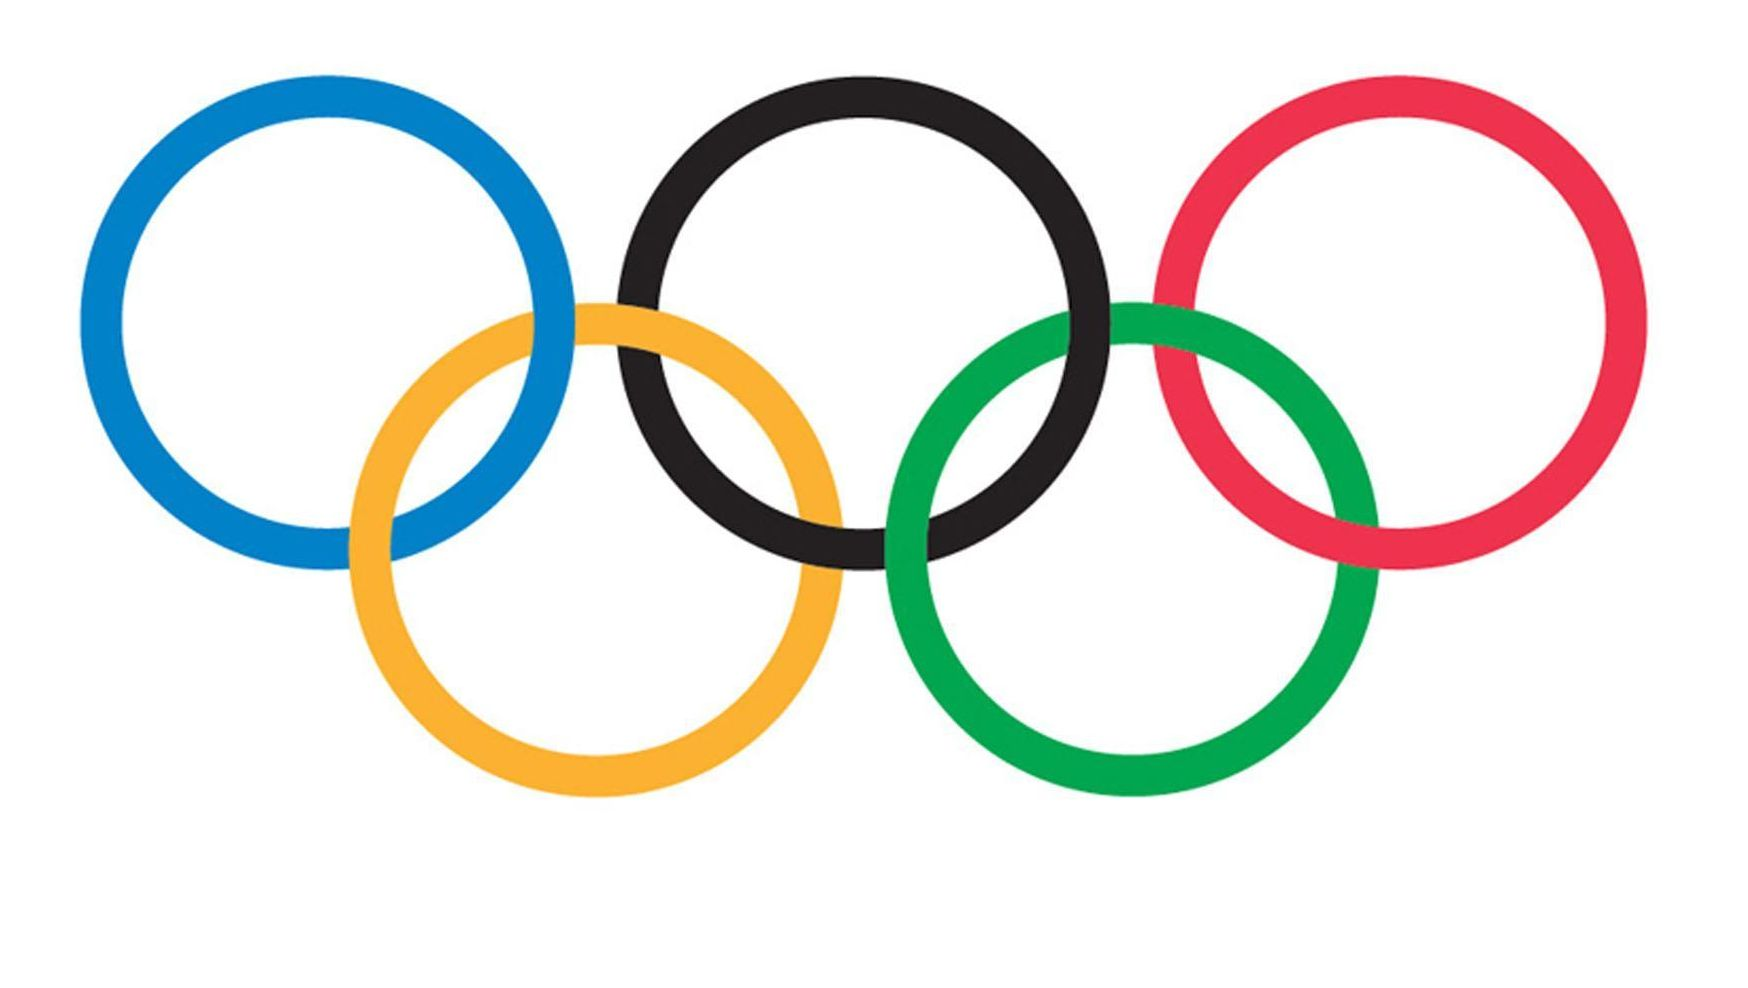 Olimpiadi: Toscana 2028, Giani rilancia candidatura dopo no di Roma